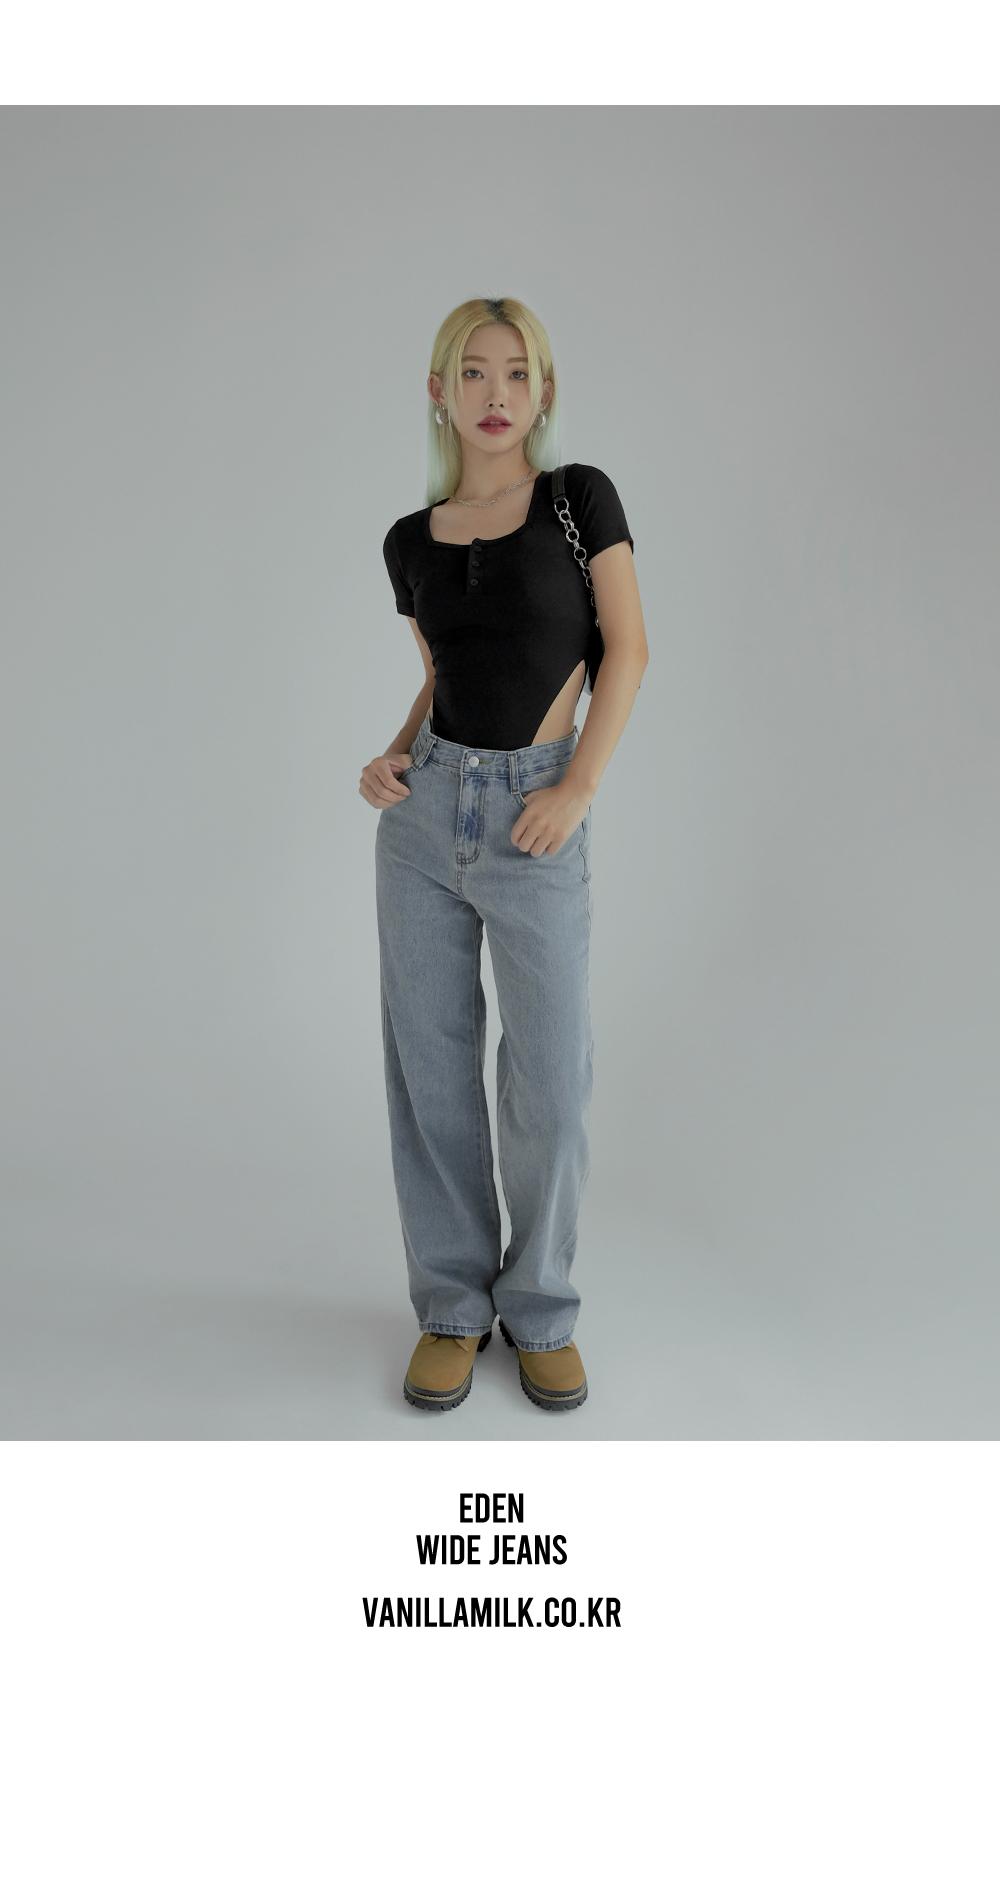 Edden wide denim trousers